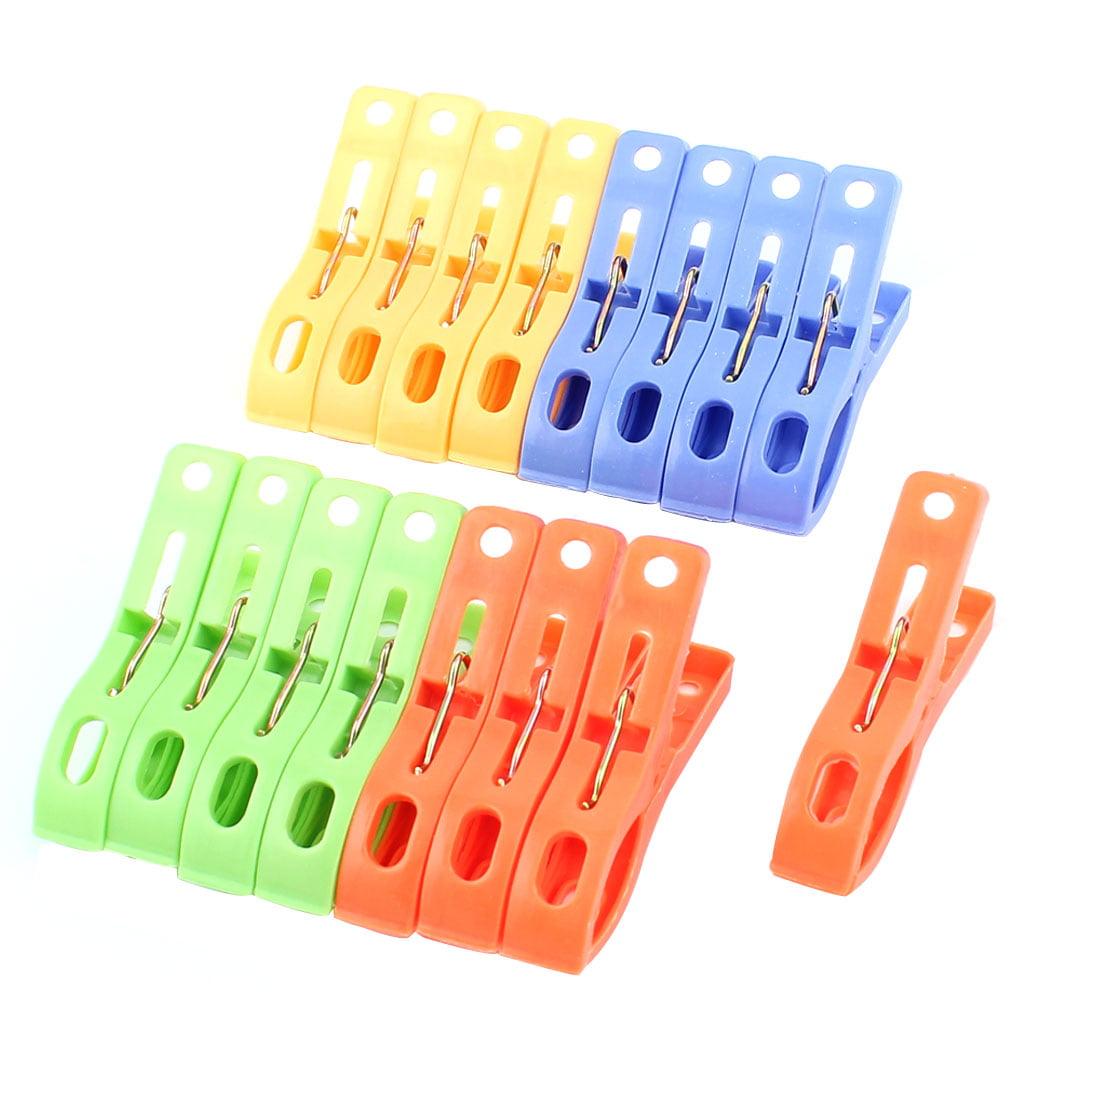 Home Laundry Plastic Clothespins Soft-Grip Clothes Line Clips 16pcs